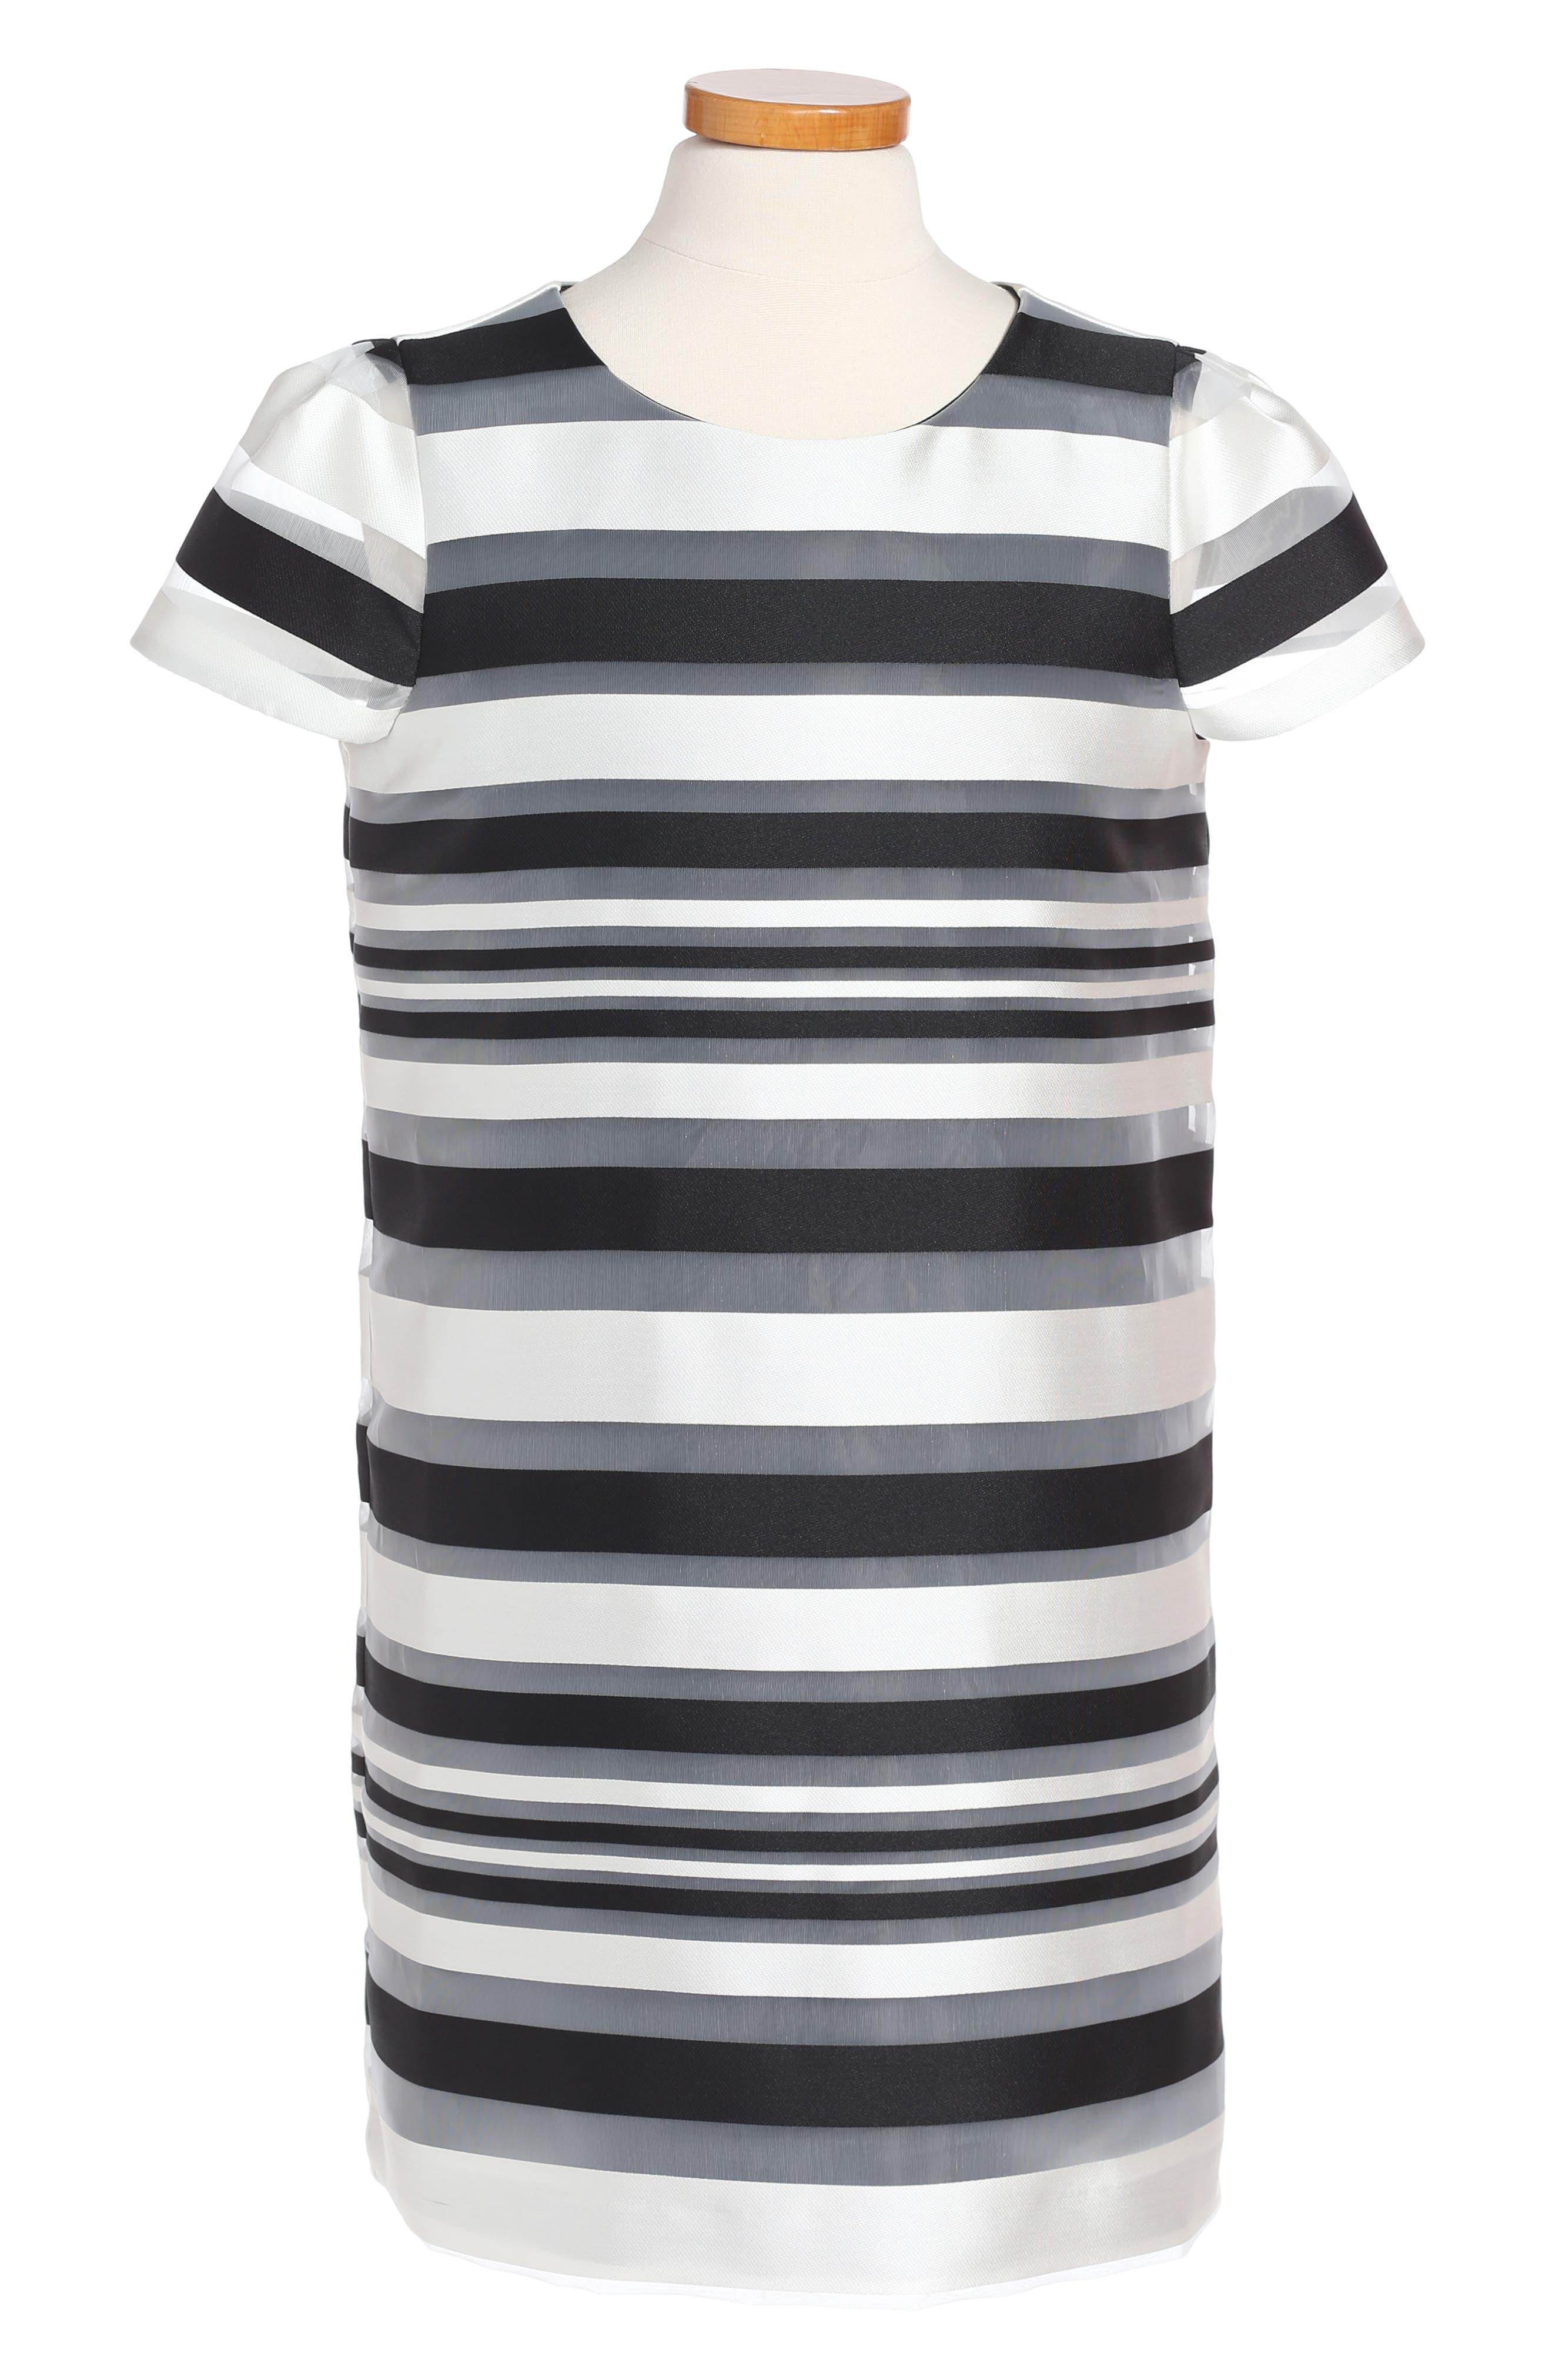 Chloe Illusion Stripe Shift Dress,                         Main,                         color, White/ Black